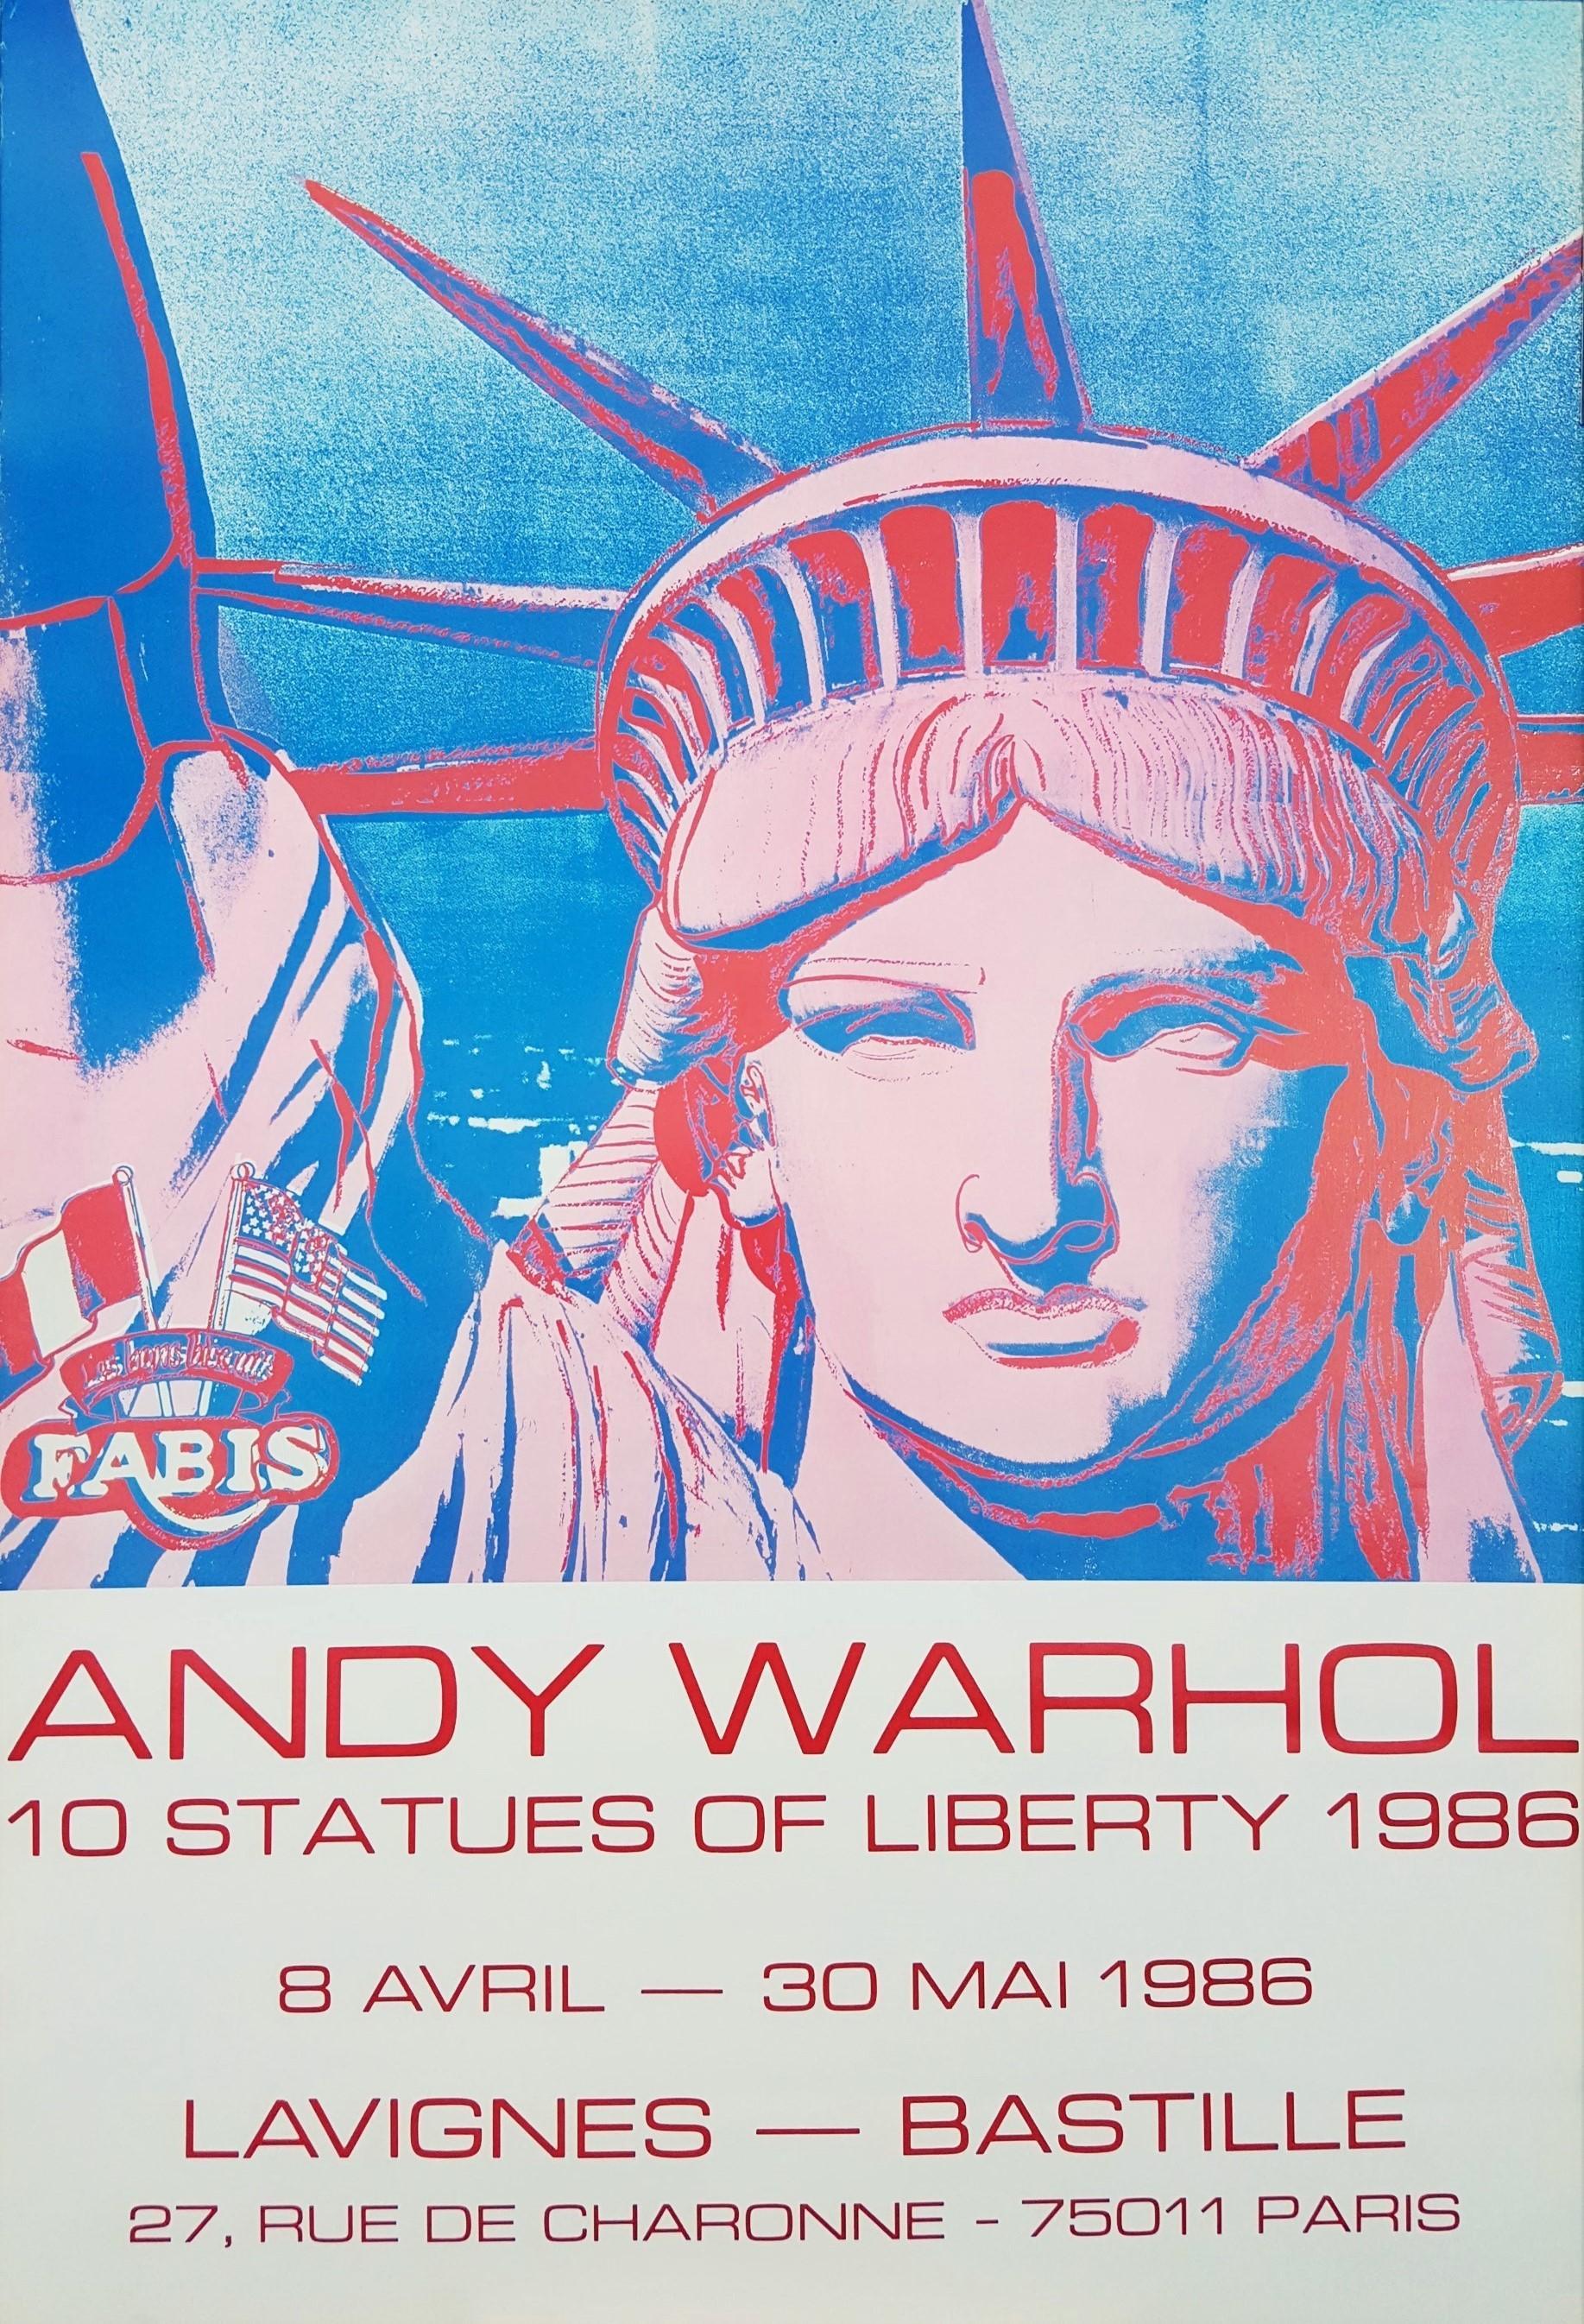 Galerie Lavignes Bastille (10 Statues of Liberty)